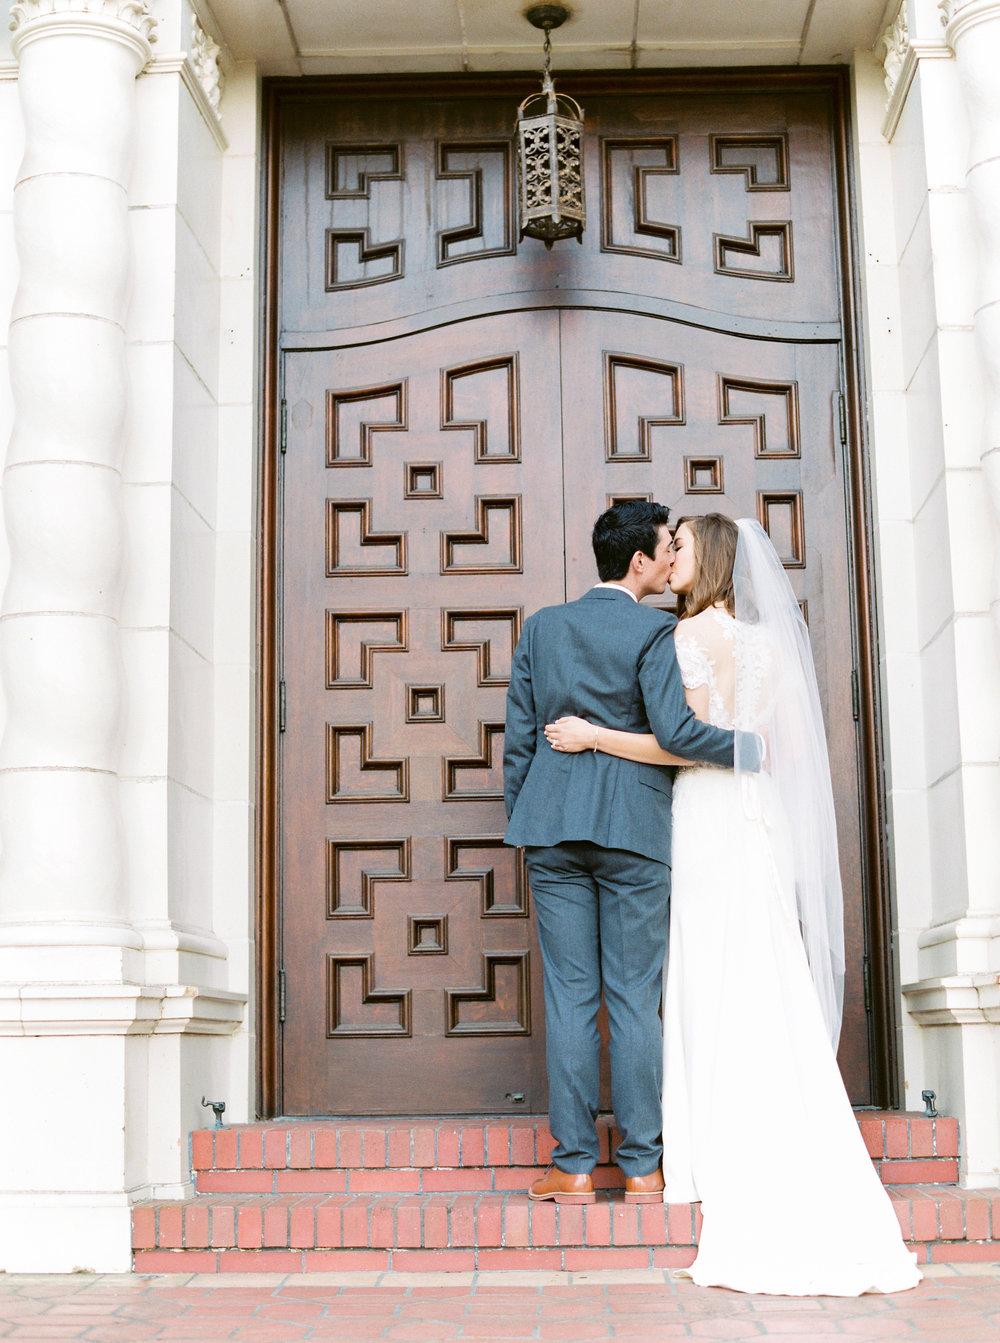 Log-cabin-wedding-in-presidio-san-francisco-california-desintation-wedding-photography-124.jpg